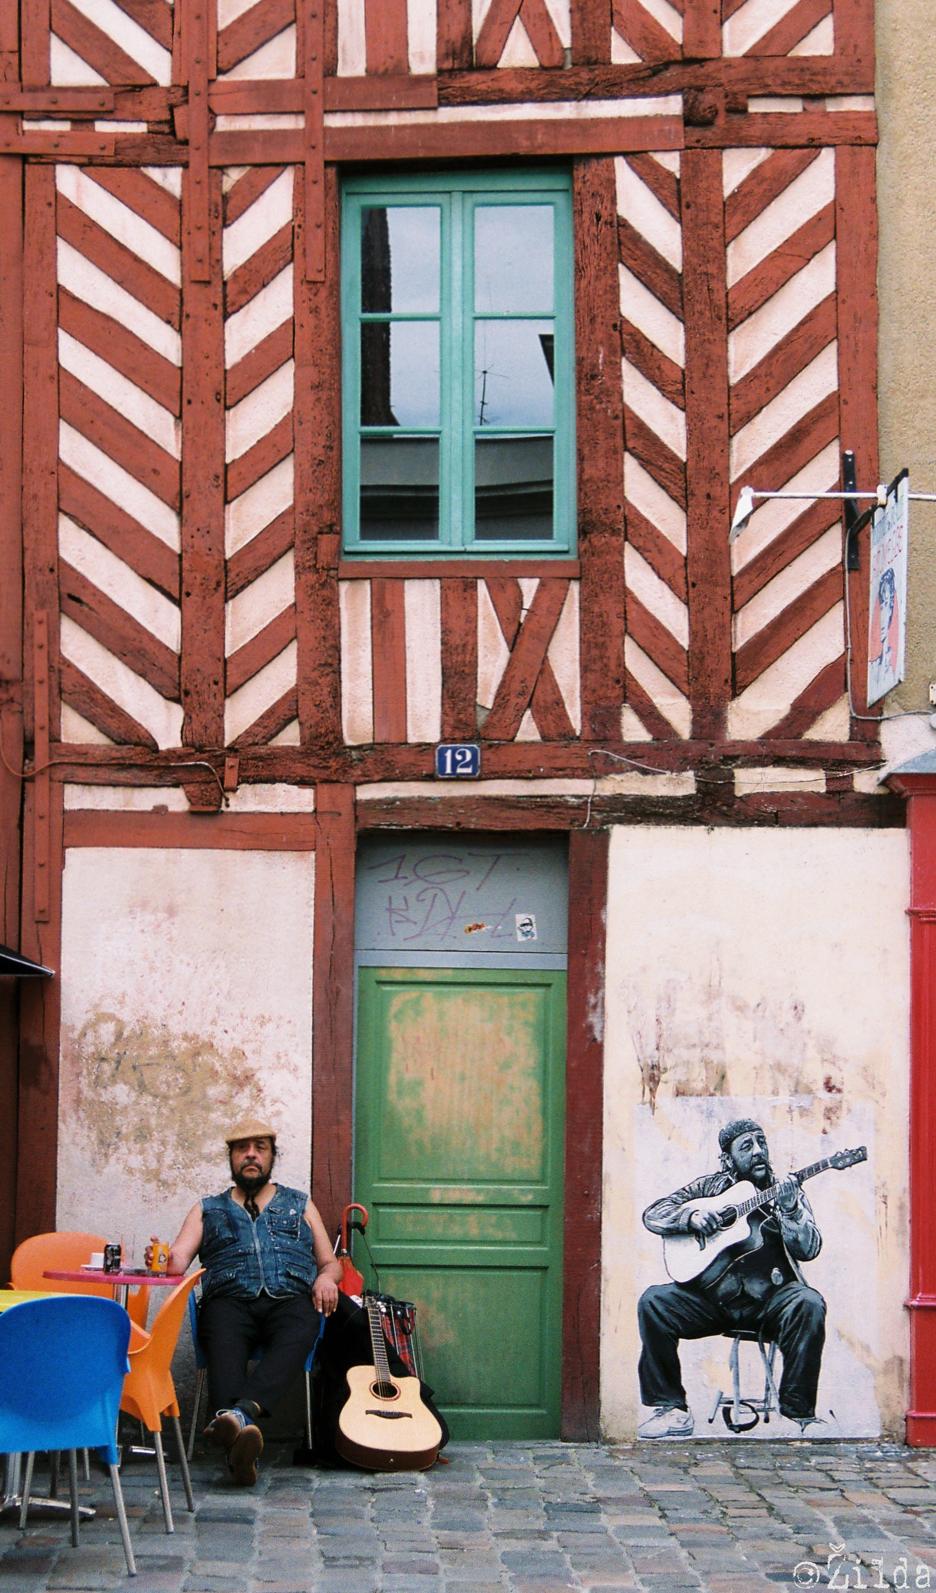 http://4.bp.blogspot.com/-Ms9hFSmD2vY/UOQOwbu0J3I/AAAAAAAACTk/X6YF1tWUWoU/s1600/Carlos+Rennes+Zilda+street+art.jpg